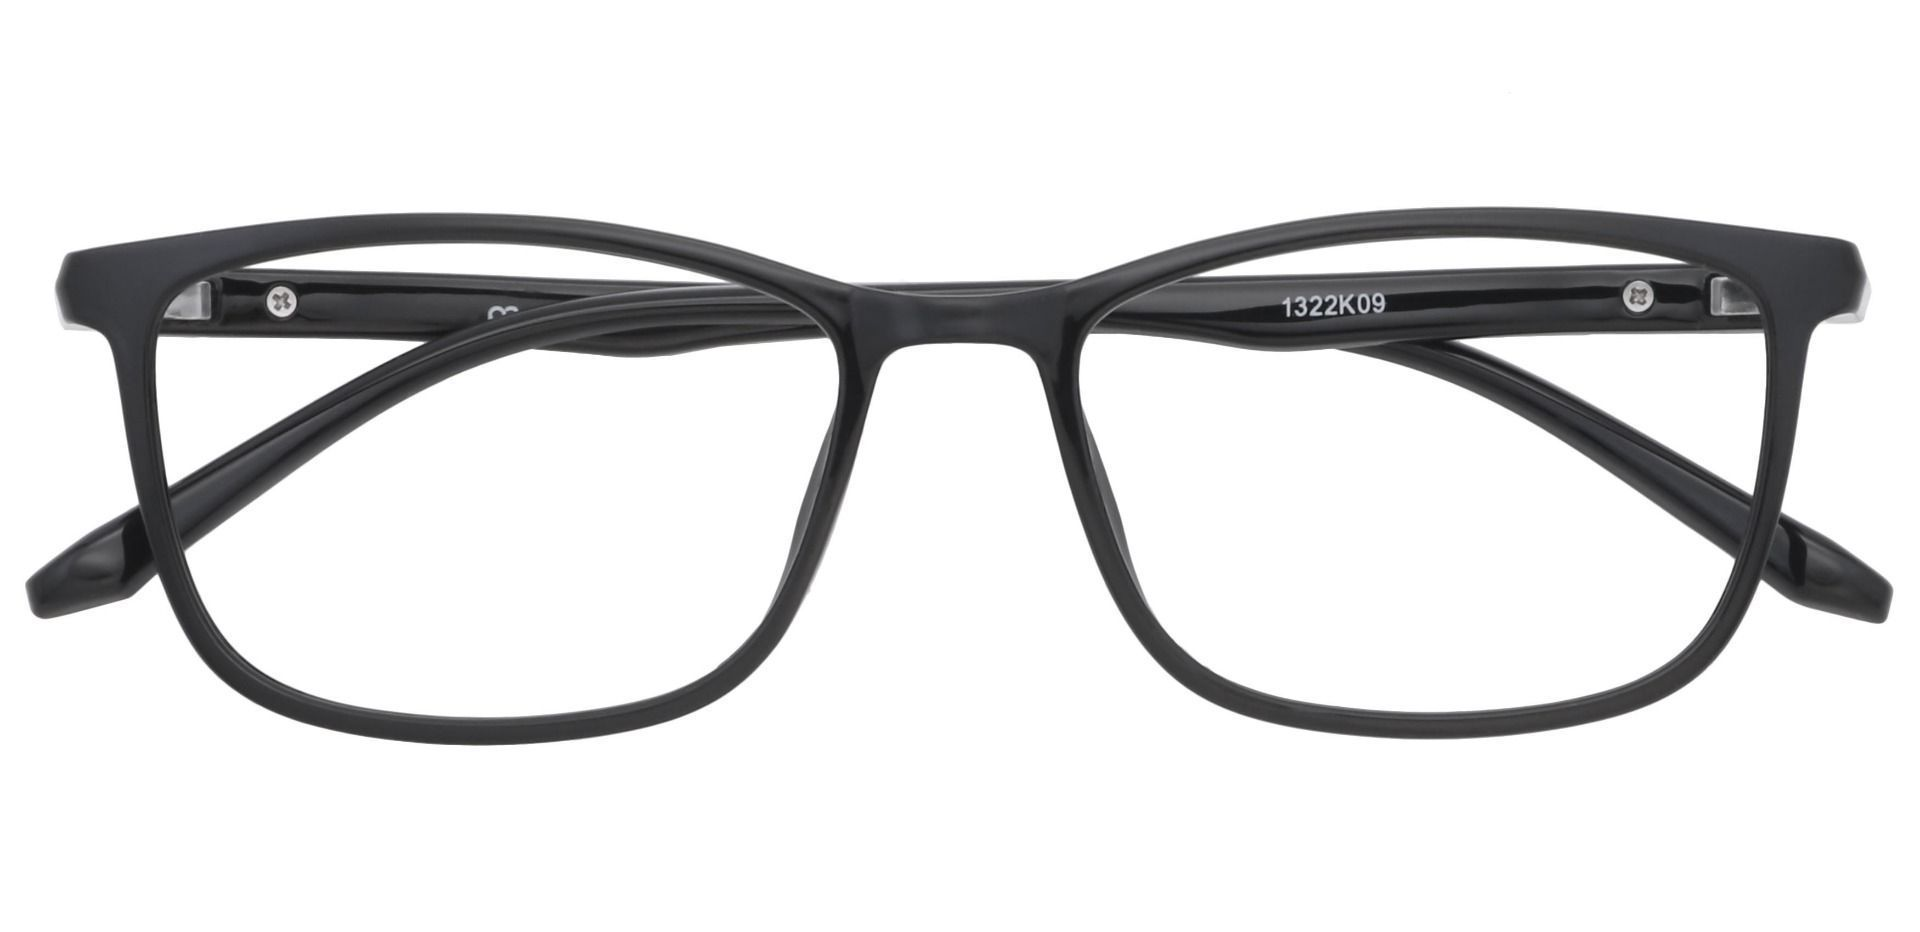 Harvest Rectangle Non-Rx Glasses - Black